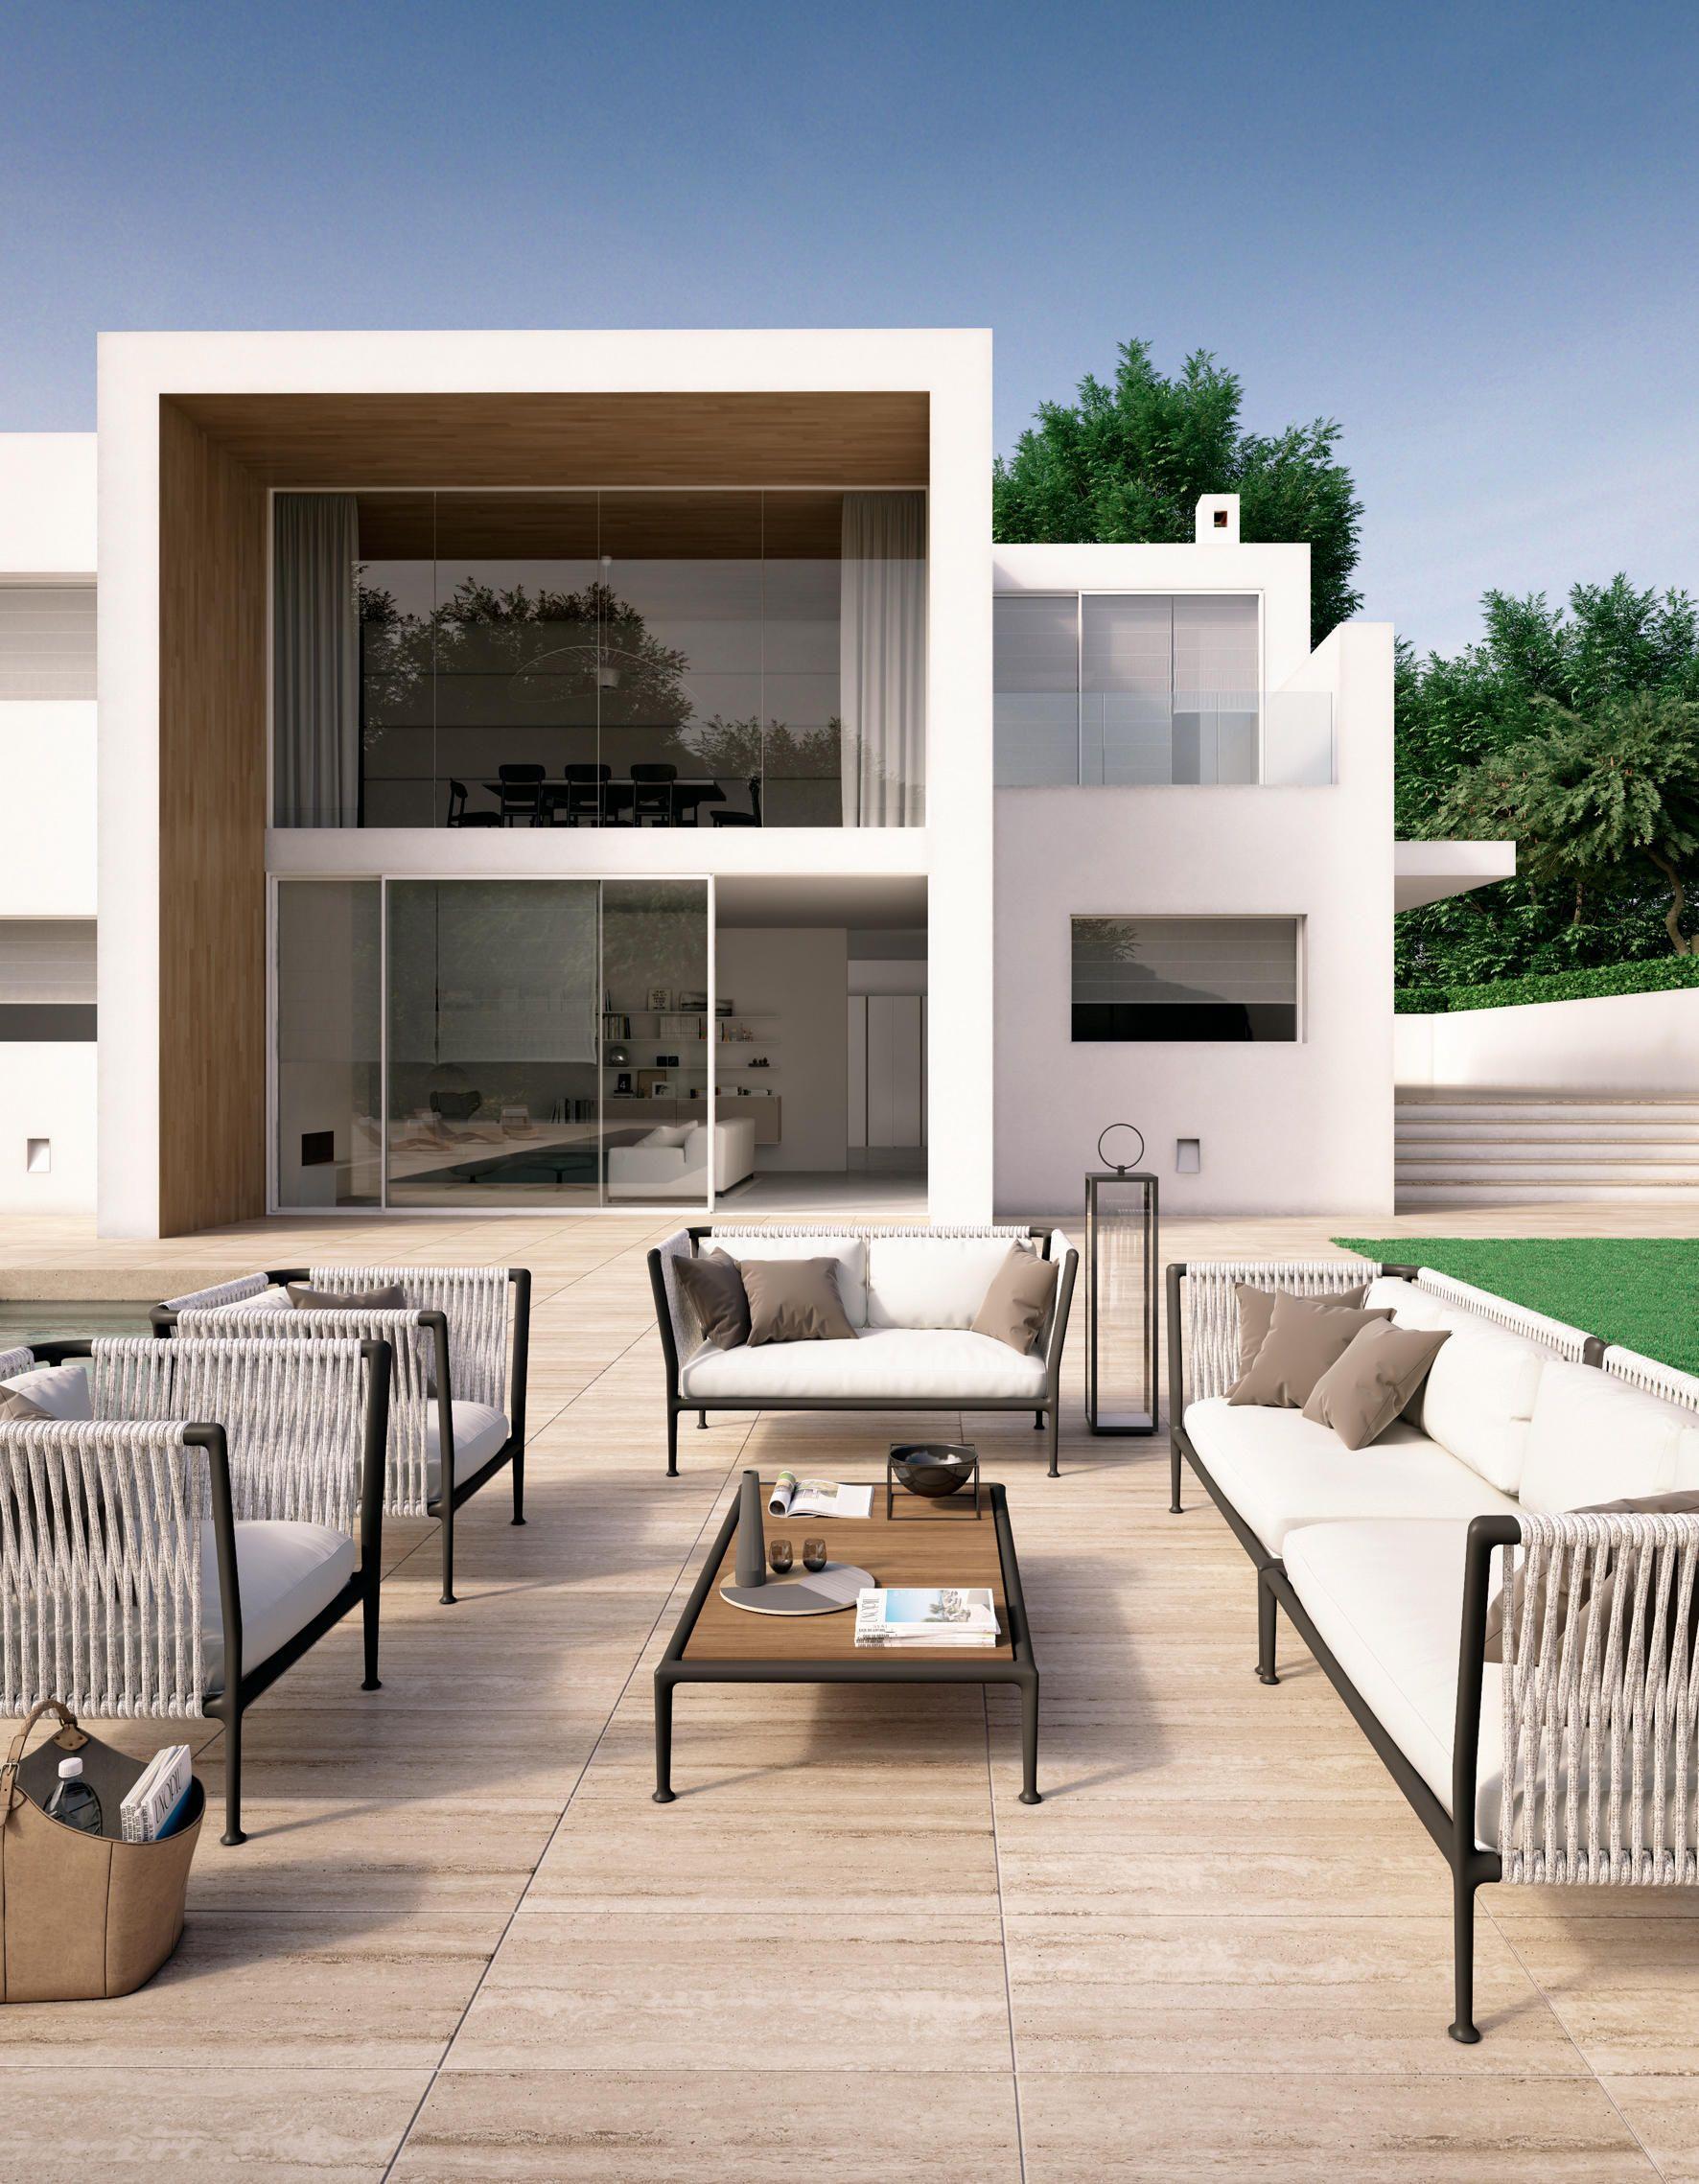 TREBLE - Sofas from Unopiù | Architonic in 2019 | Outdoor ...